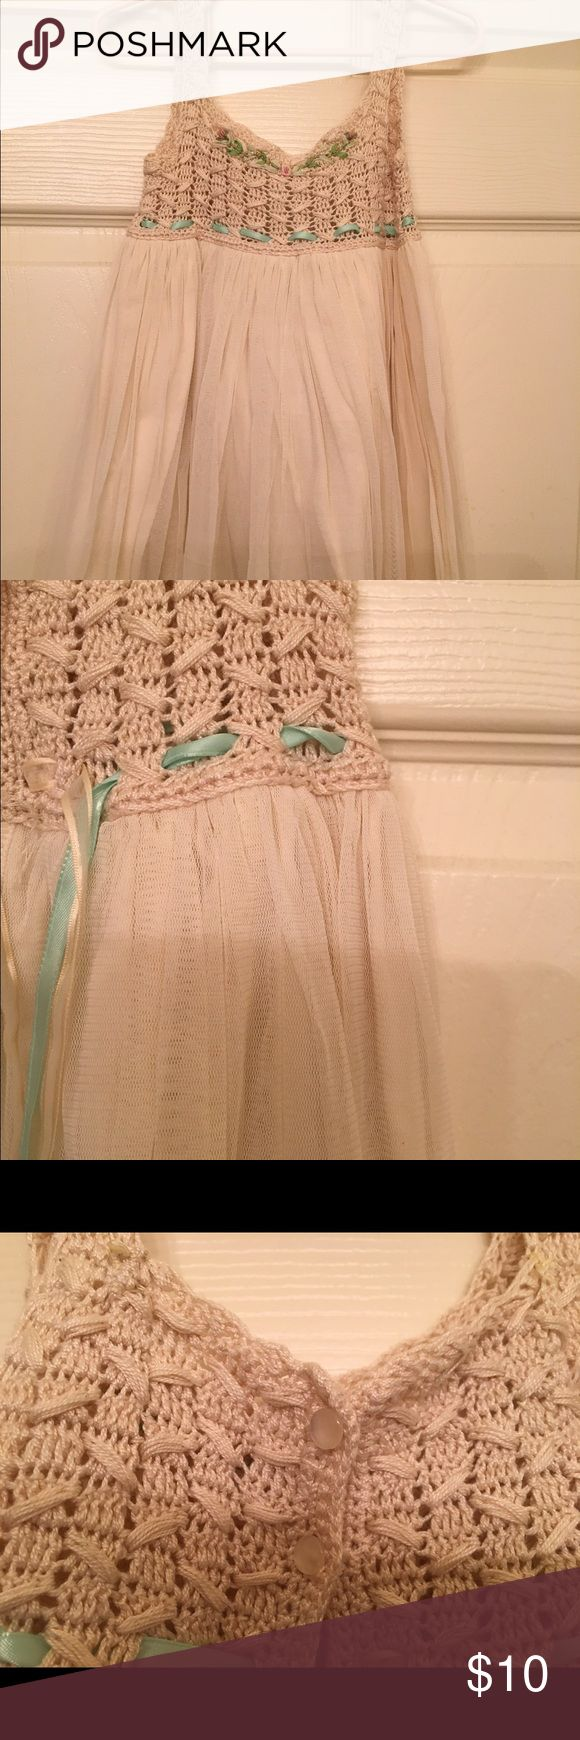 Victoria's kids crochet tutu dress Champagne empire waist baby Tule dress with crotchet top. victoria kids Dresses